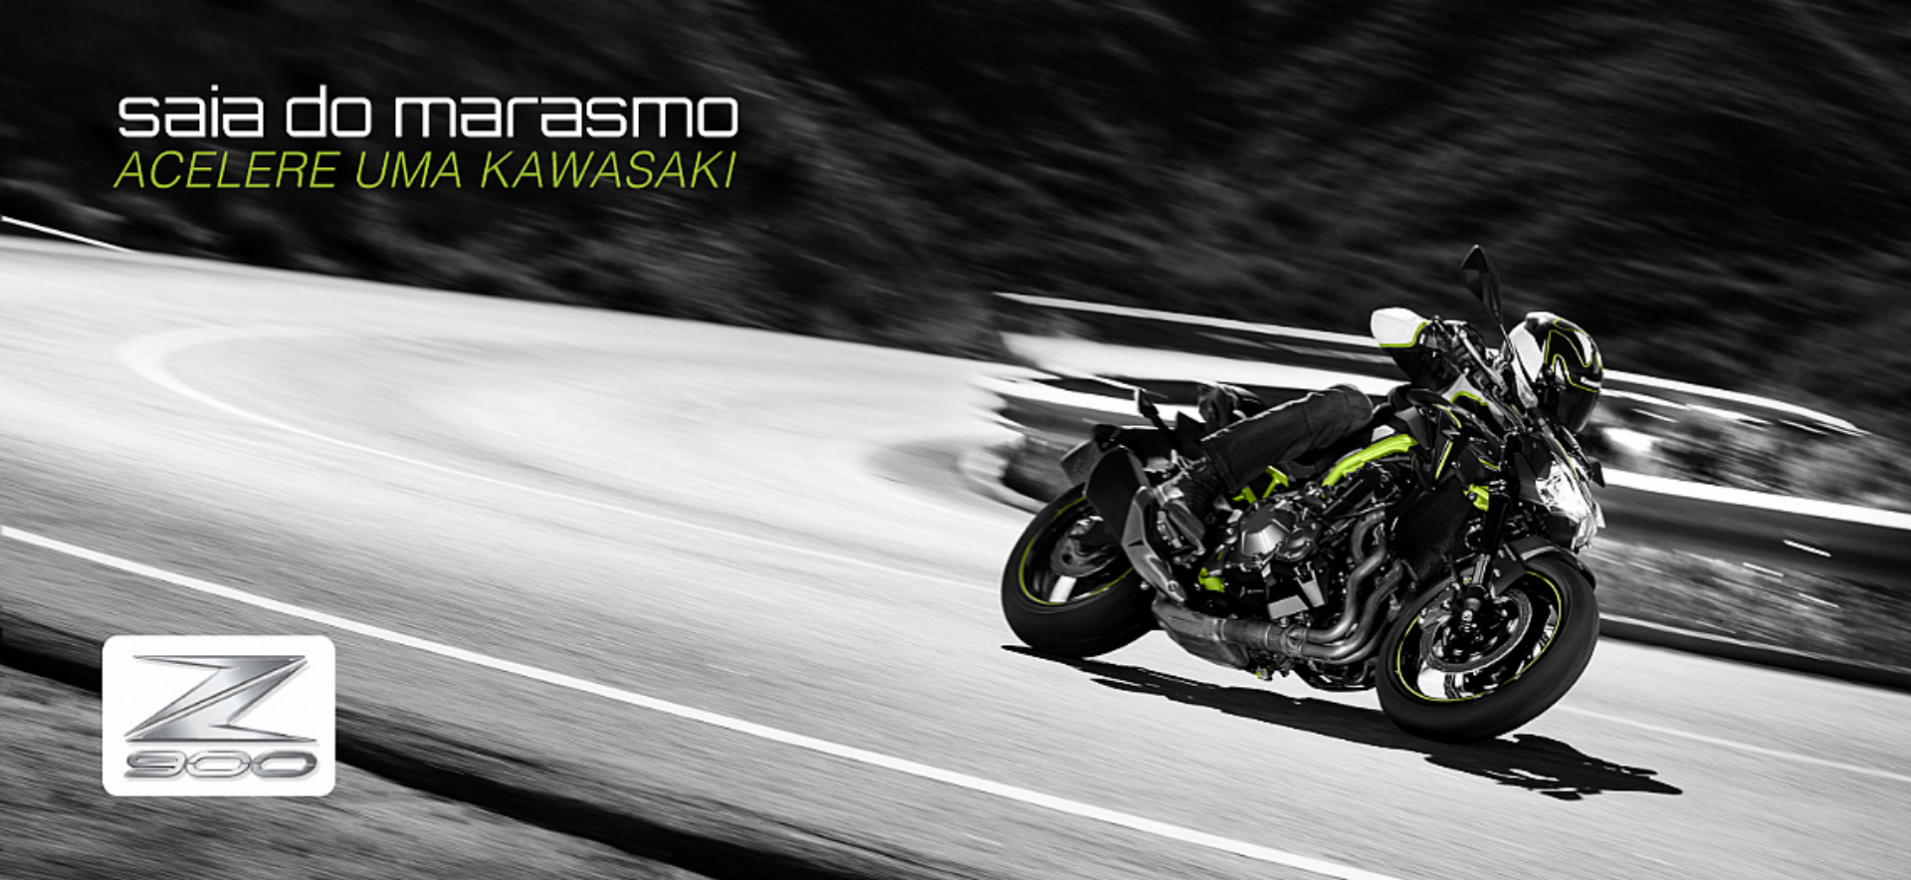 Saia do marasmo, Acelere uma Kawasaki